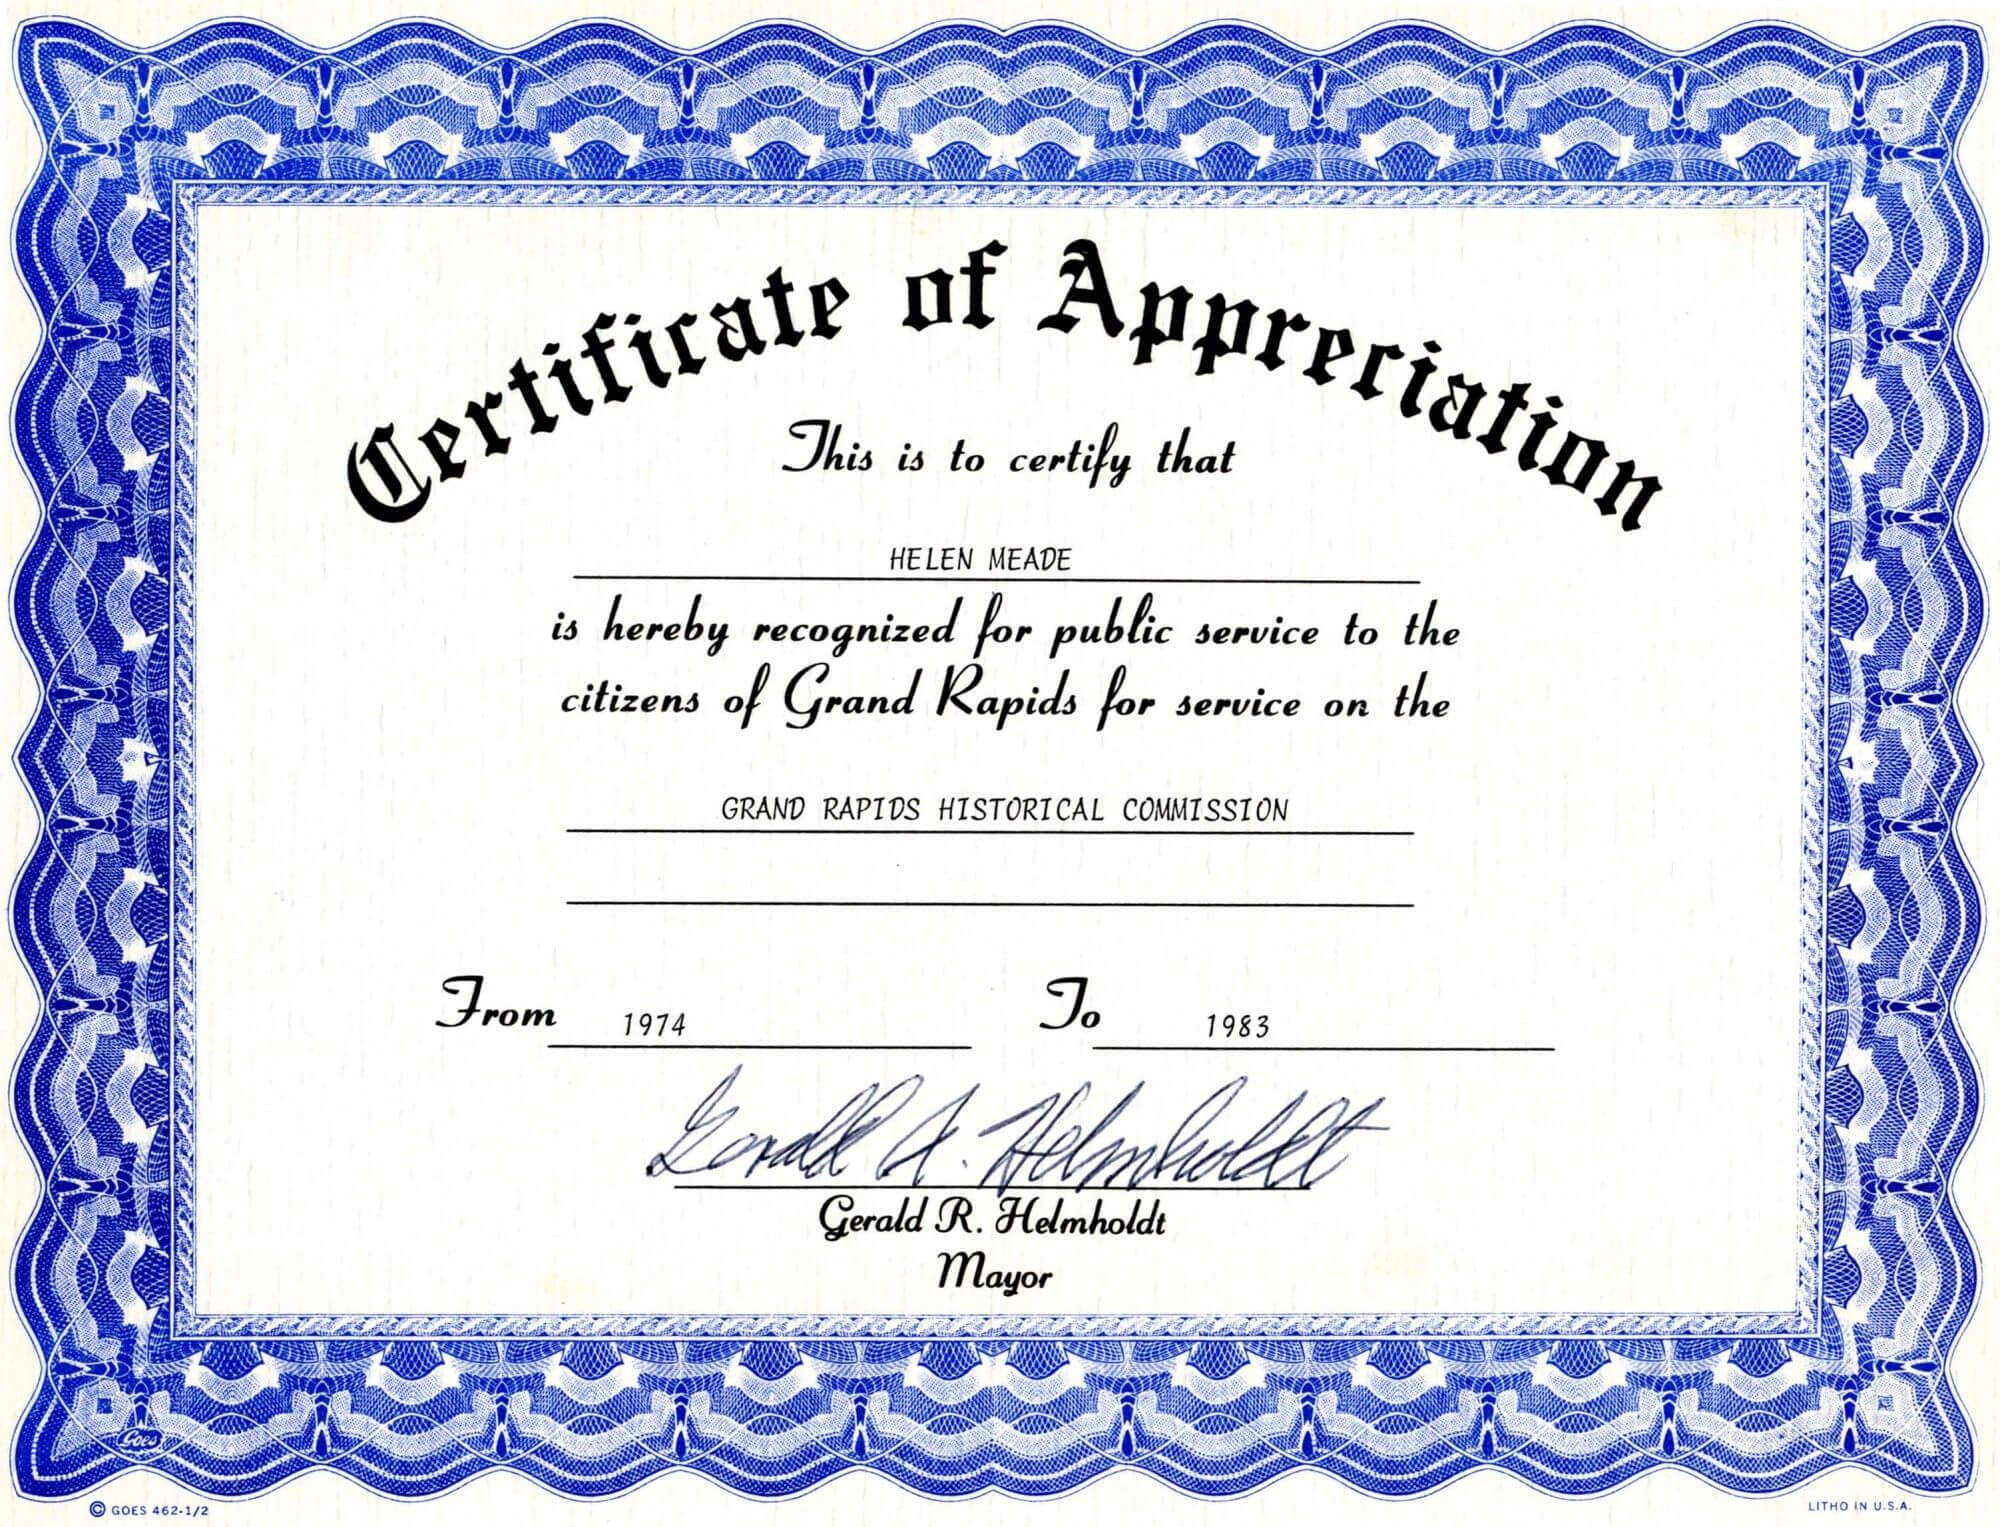 Appreciation Certificate Templates Free Download Throughout Blank Certificate Templates Free Download